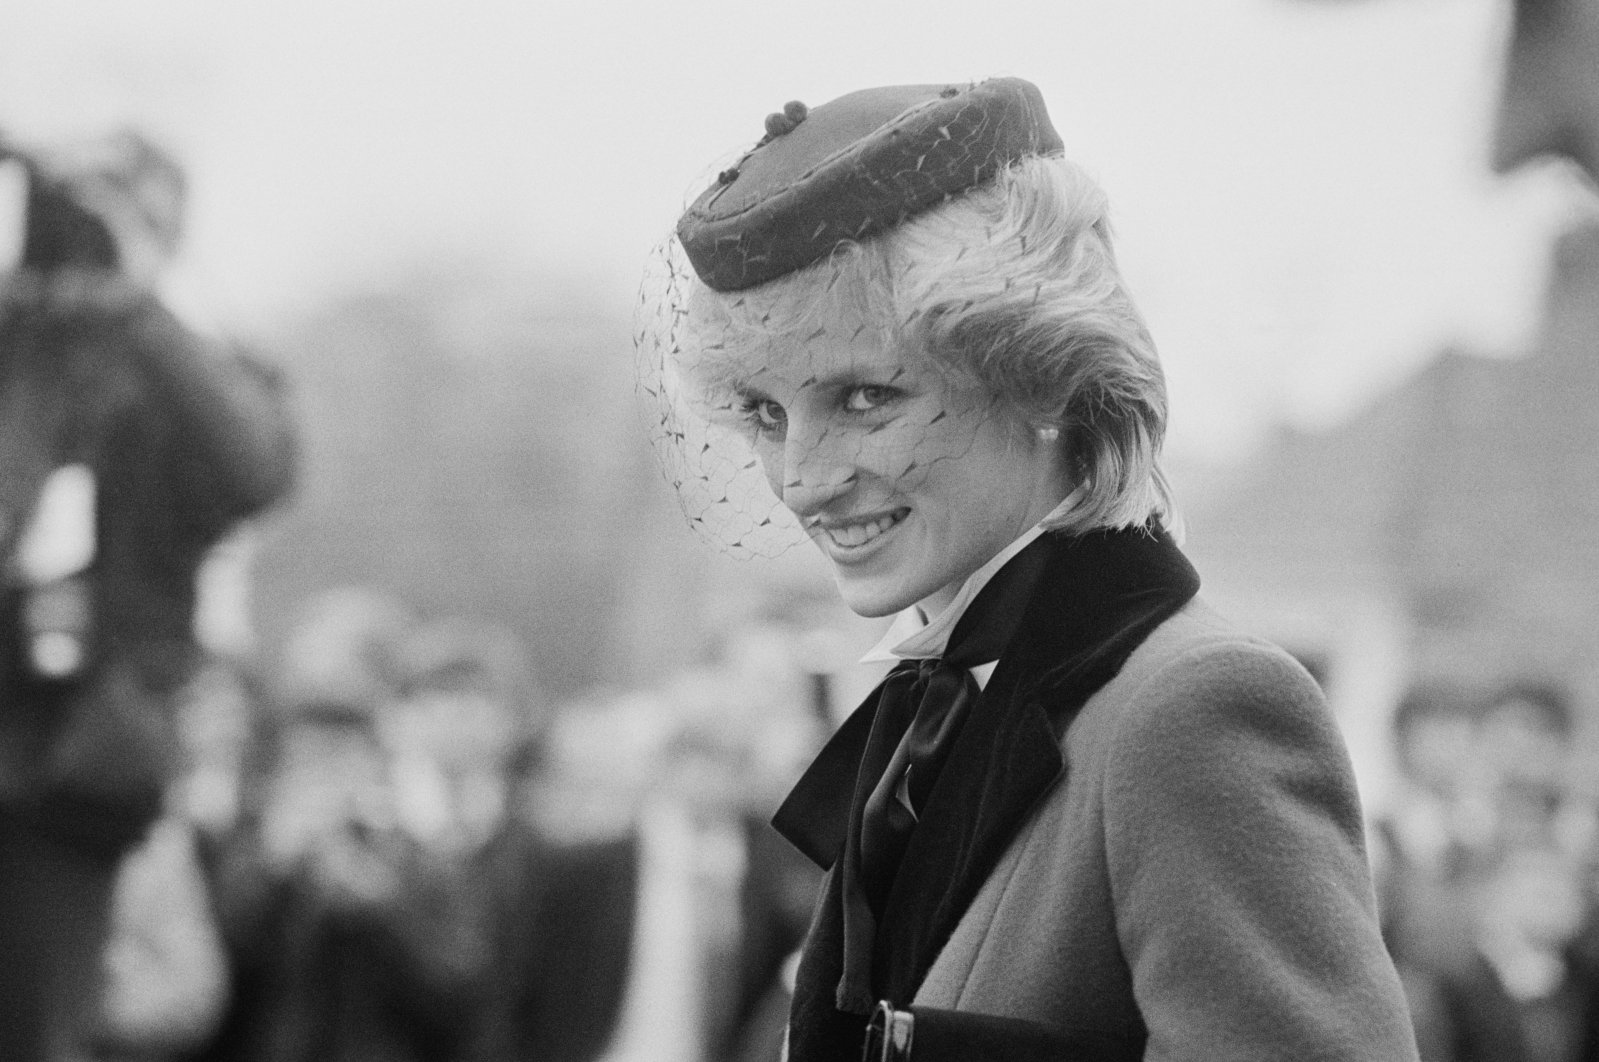 Lady Diana Spencer visits Colston's School in Bristol, U.K., Nov. 19, 1983. (Getty Images)